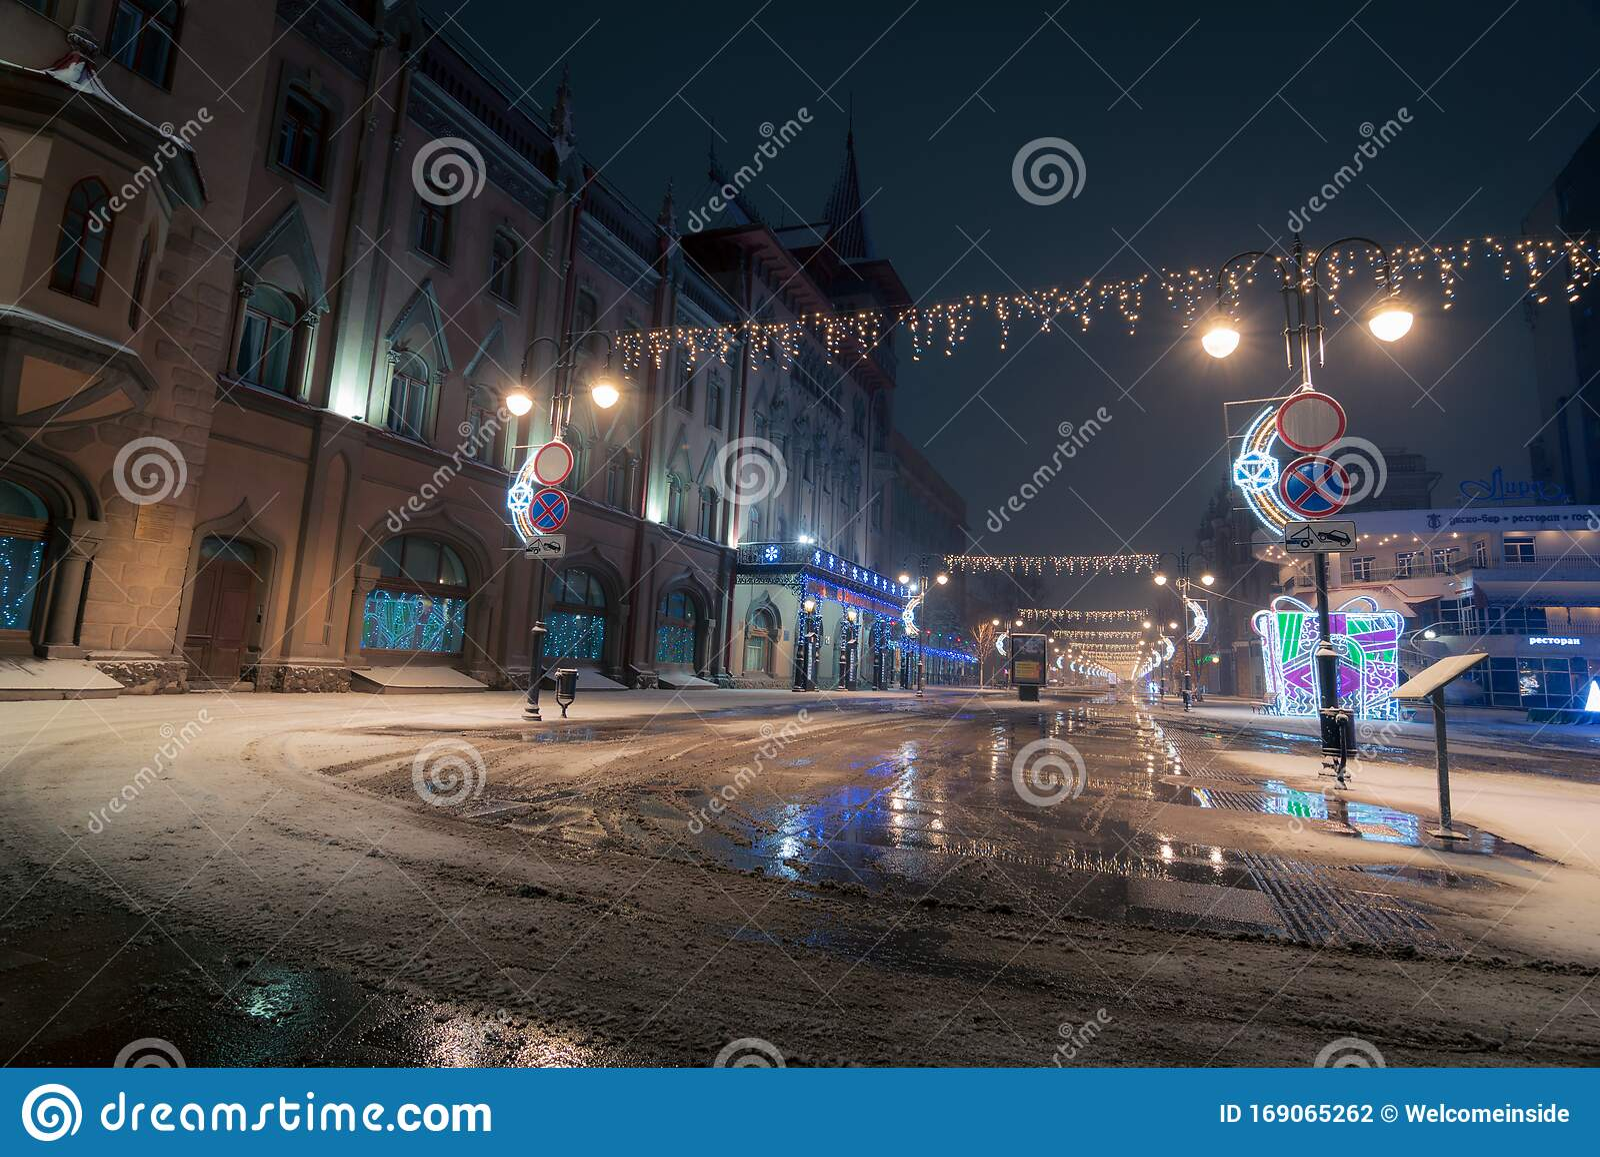 2020 Christmas Lights Pedestrian Saratov State Conservatory Named After L. V. Sobinova In Christmas